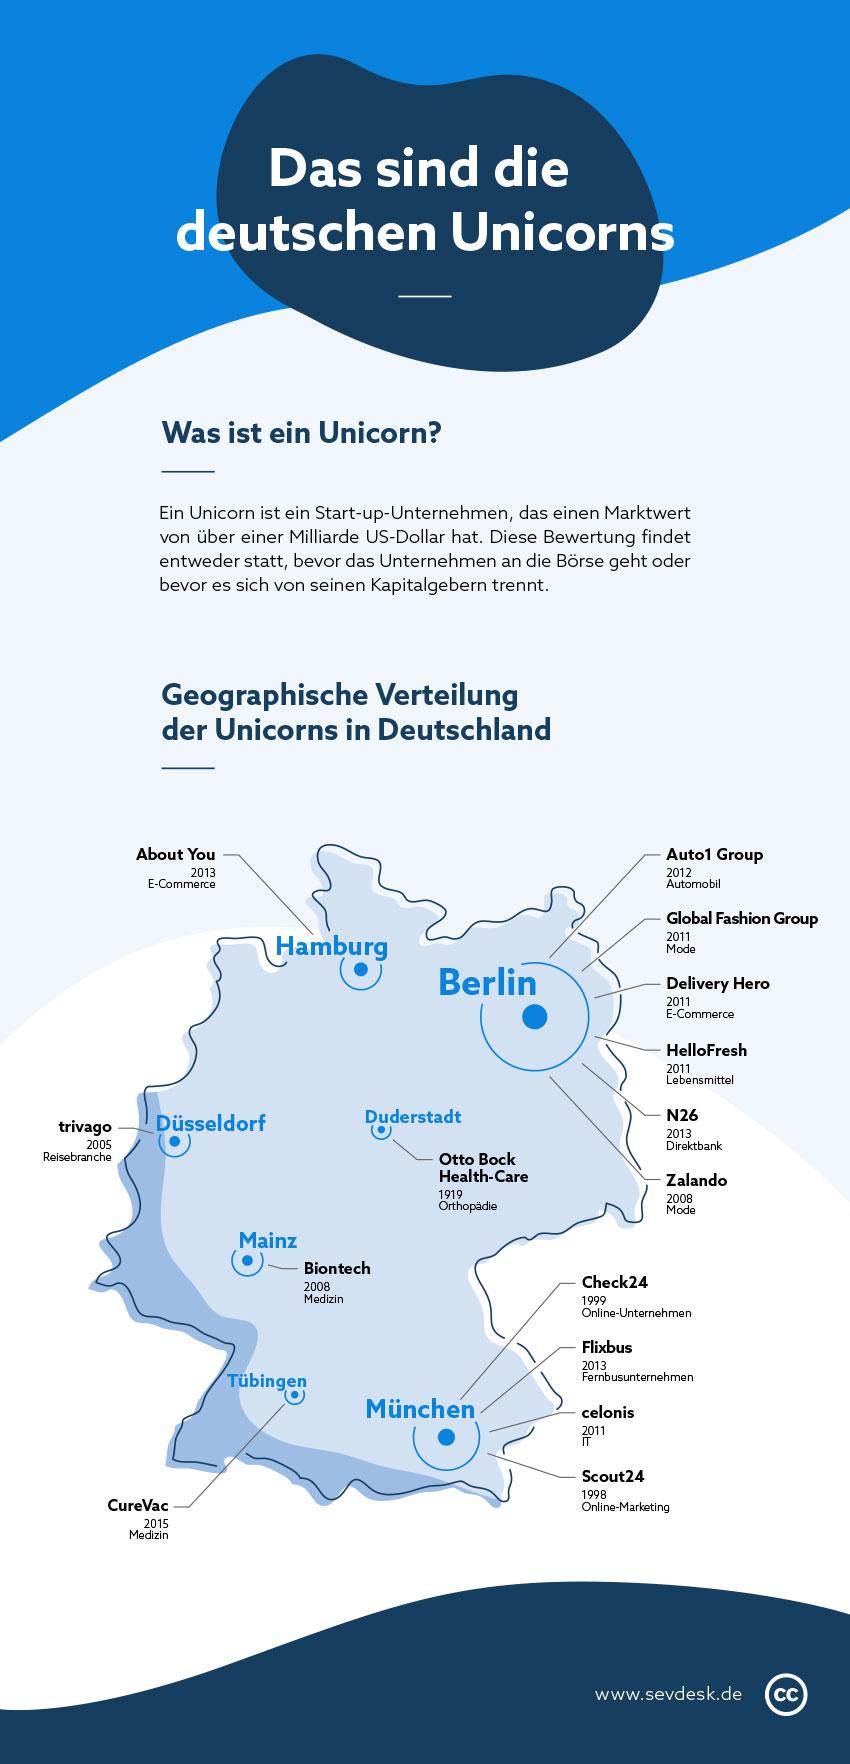 Infografik zu den deutschen Unicorns